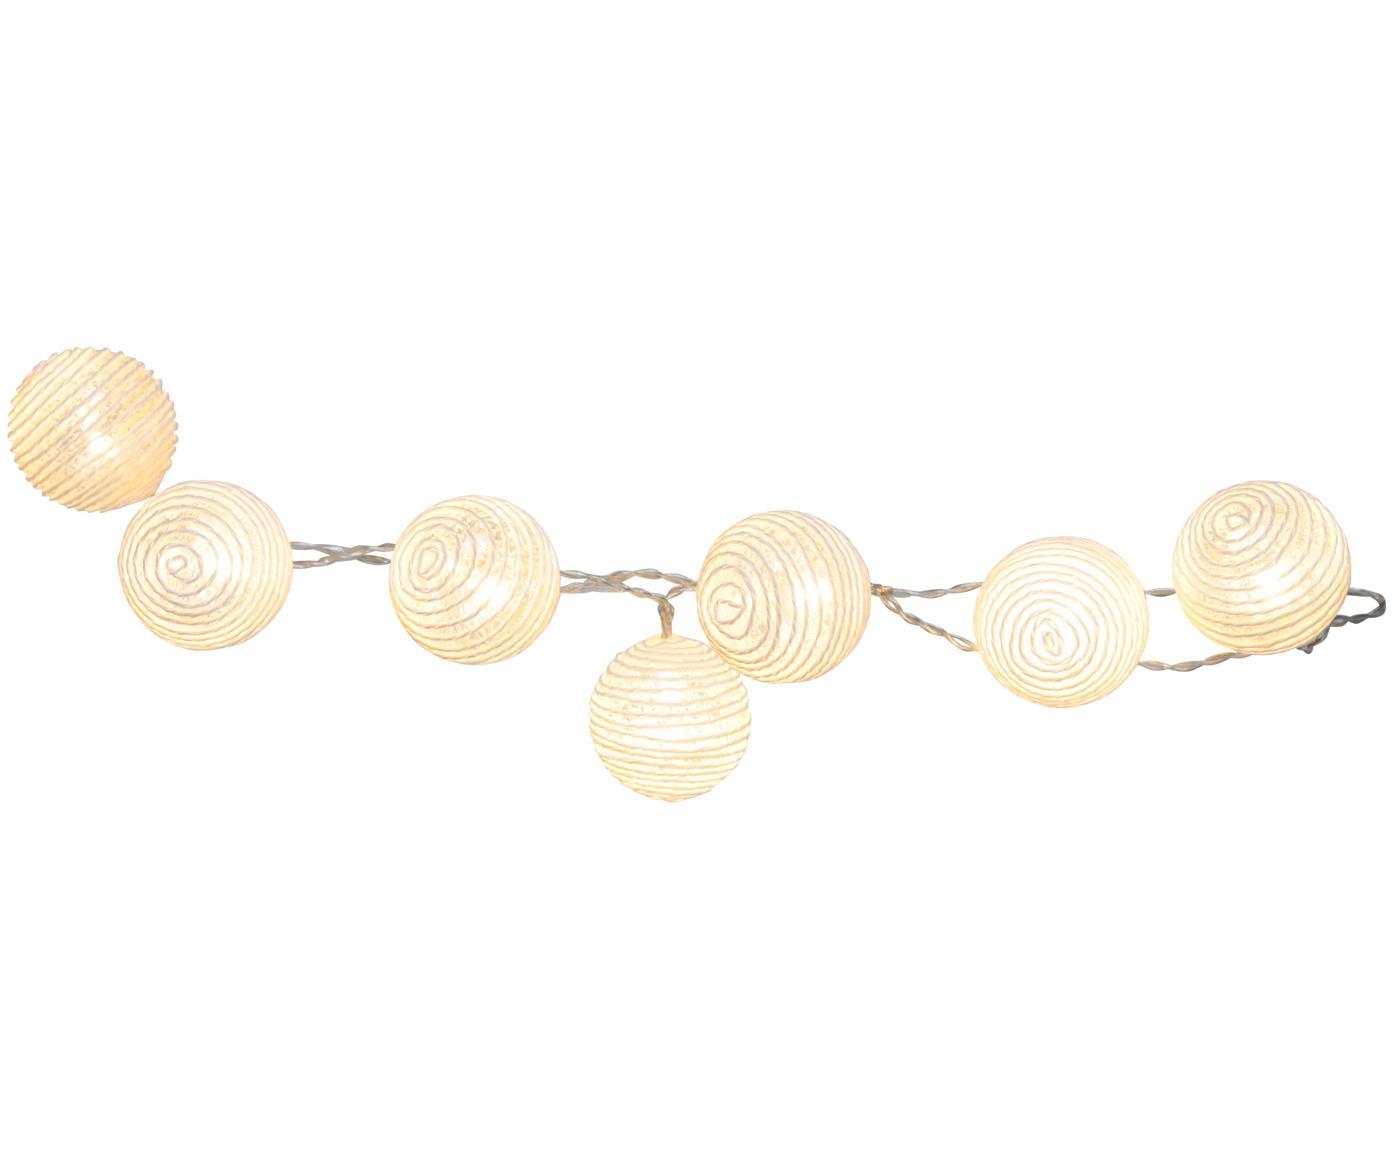 Girlanda świetlna LED Yarn, Biały, D 135 cm